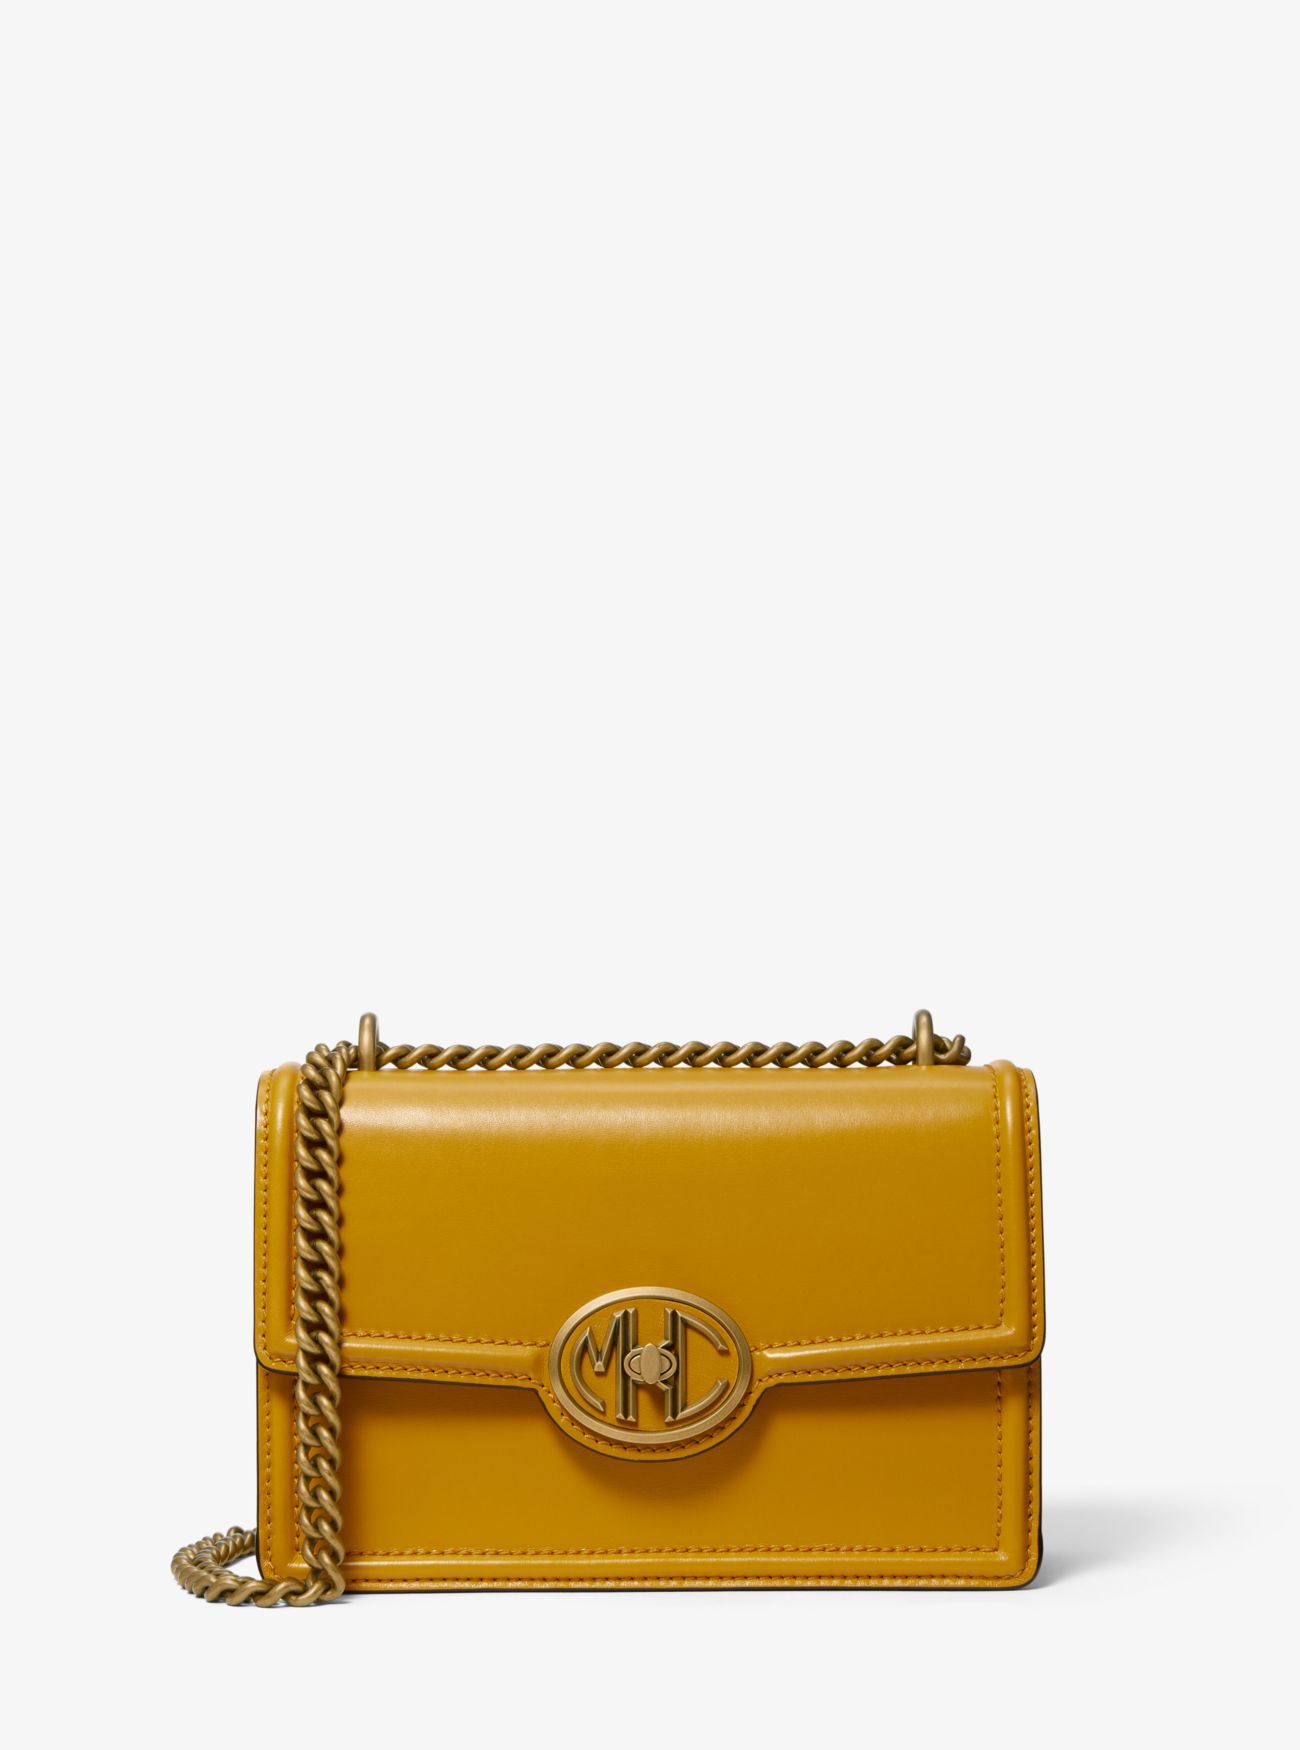 Monogramme Leather Chain Shoulder Bag Michael Kors